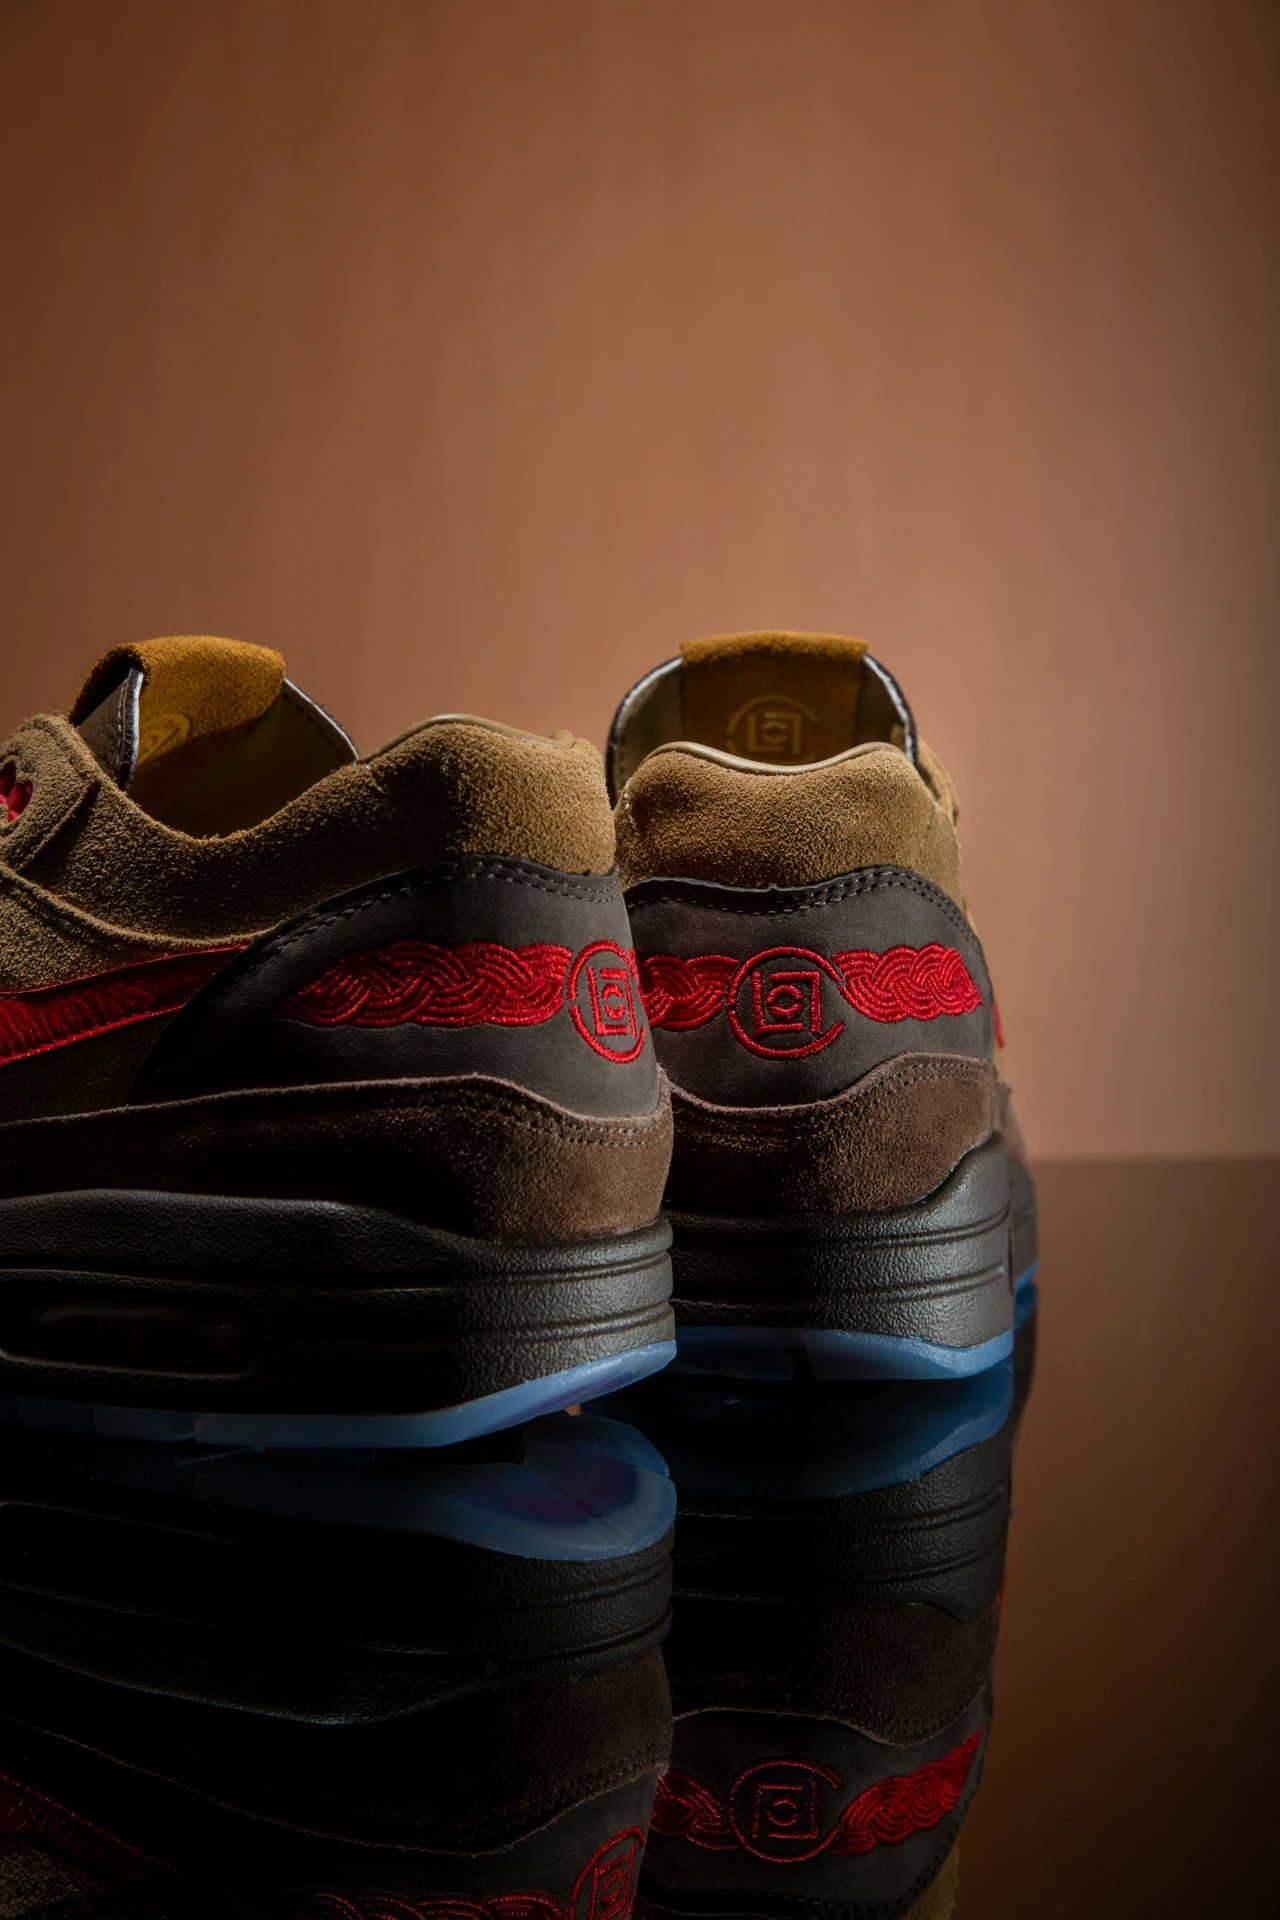 CLOT,Nike,Air Max 1,发售  冠希死亡之吻「CHA」官宣!本周发售先到先得!